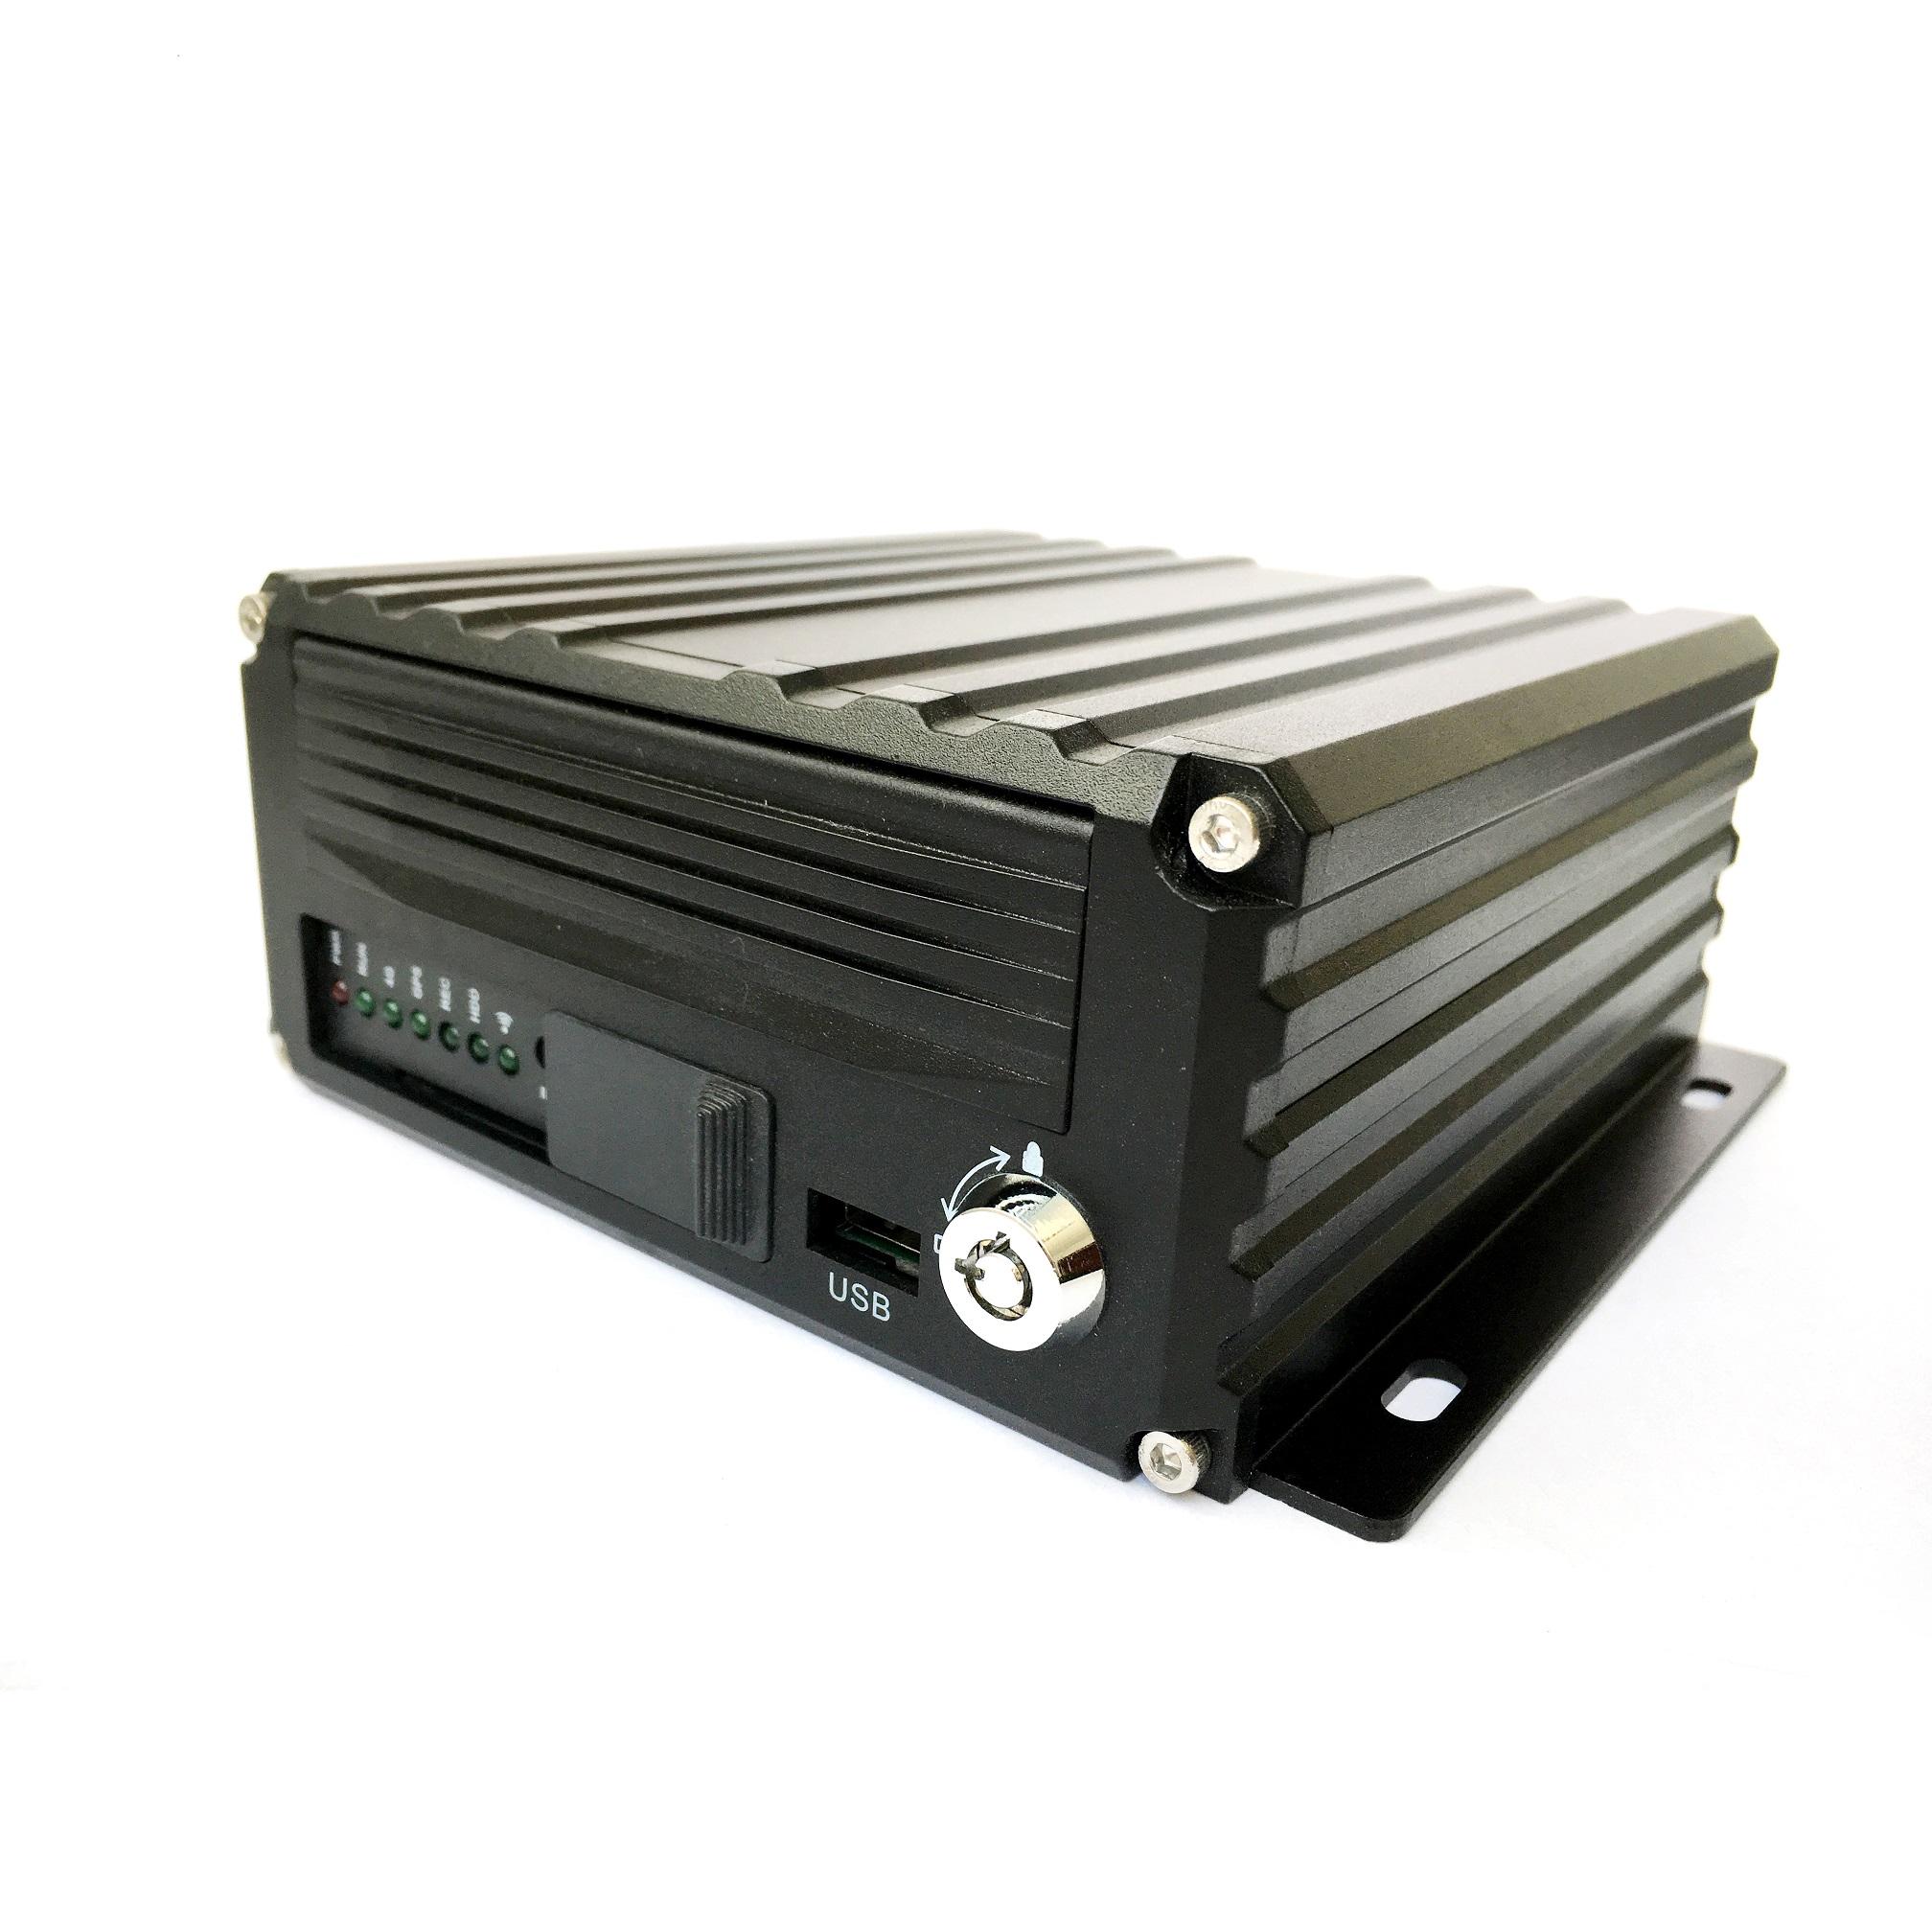 4G 8路1080P高清硬盘车载录像机